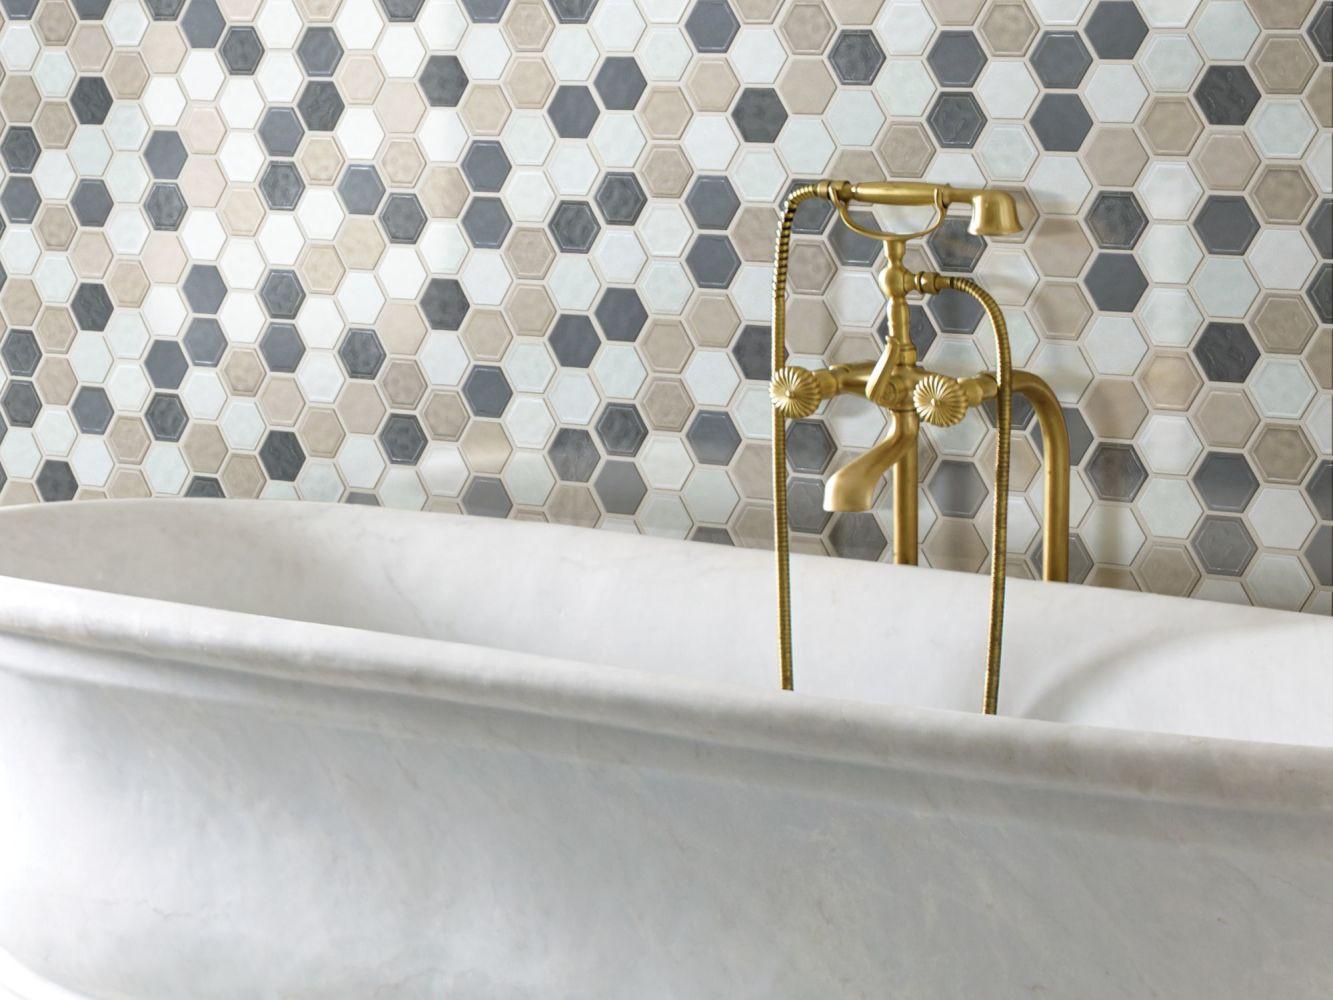 Shaw Floors Home Fn Gold Ceramic Geoscapes Hexagon Warm Blend 00520_TGJ78